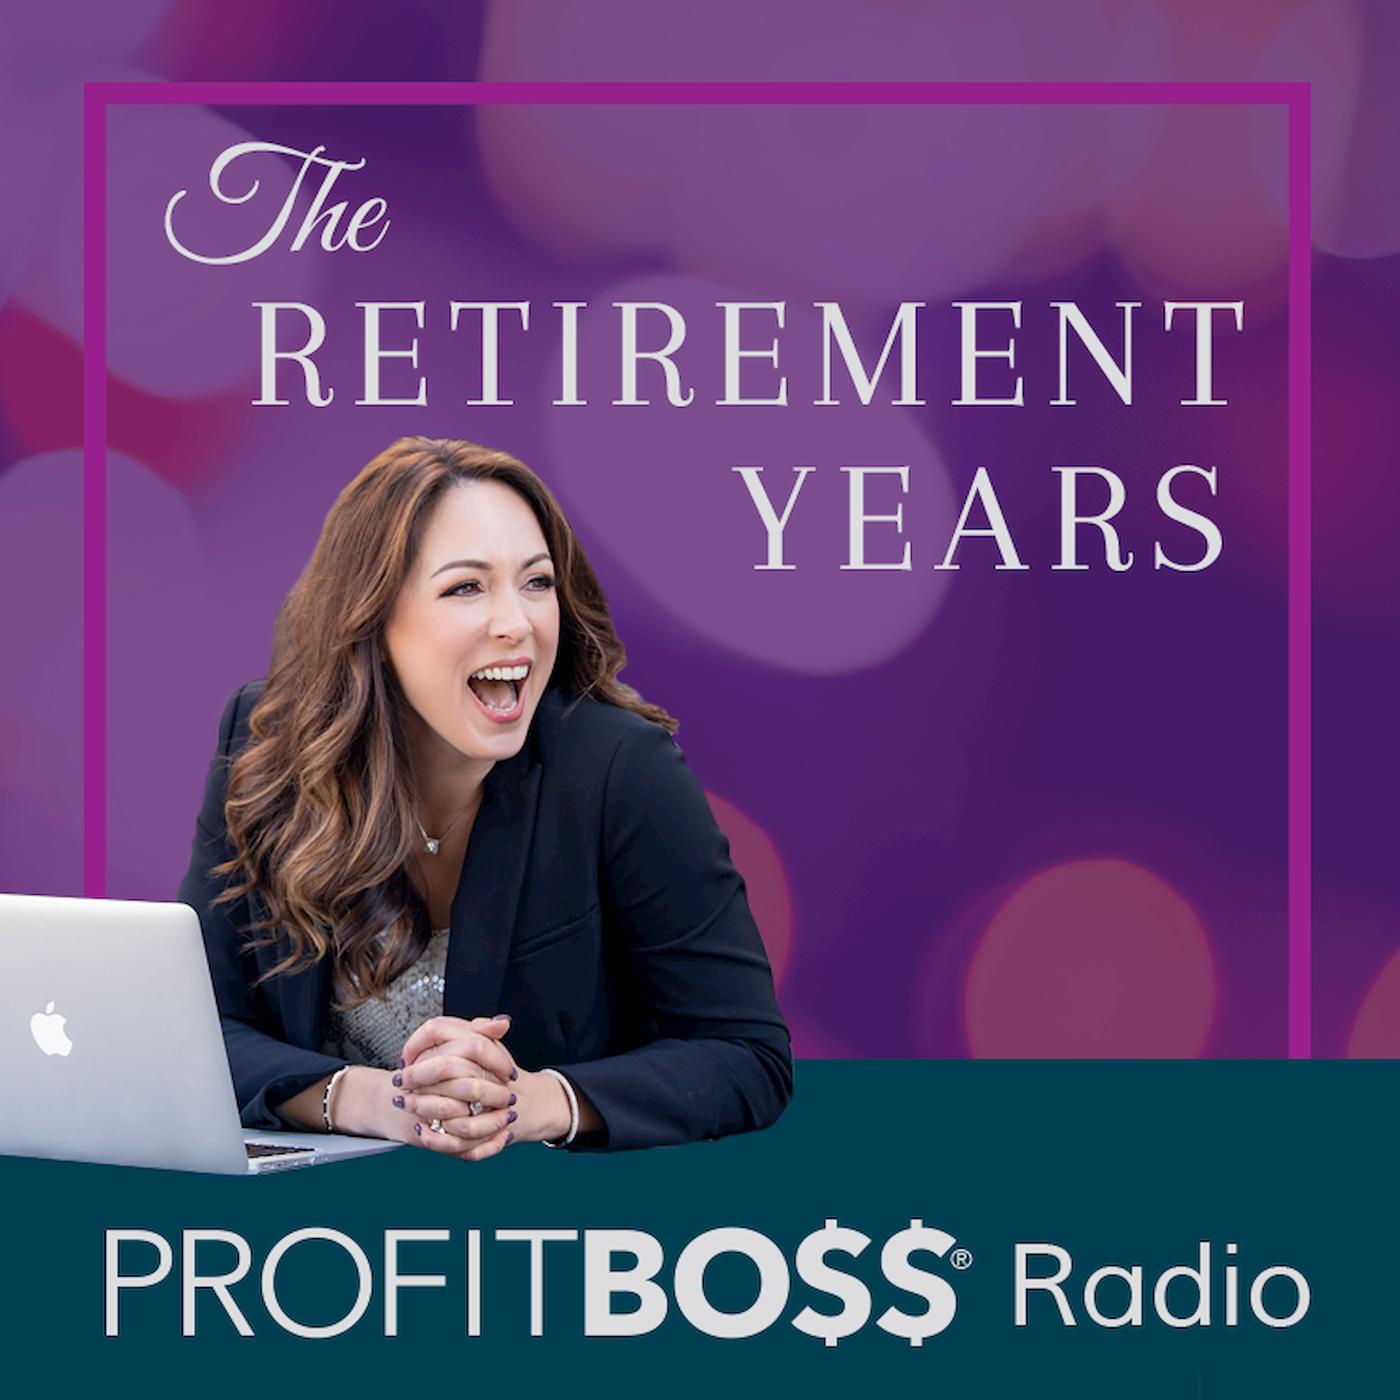 The Retirement Years on Profit Boss® Radio show art